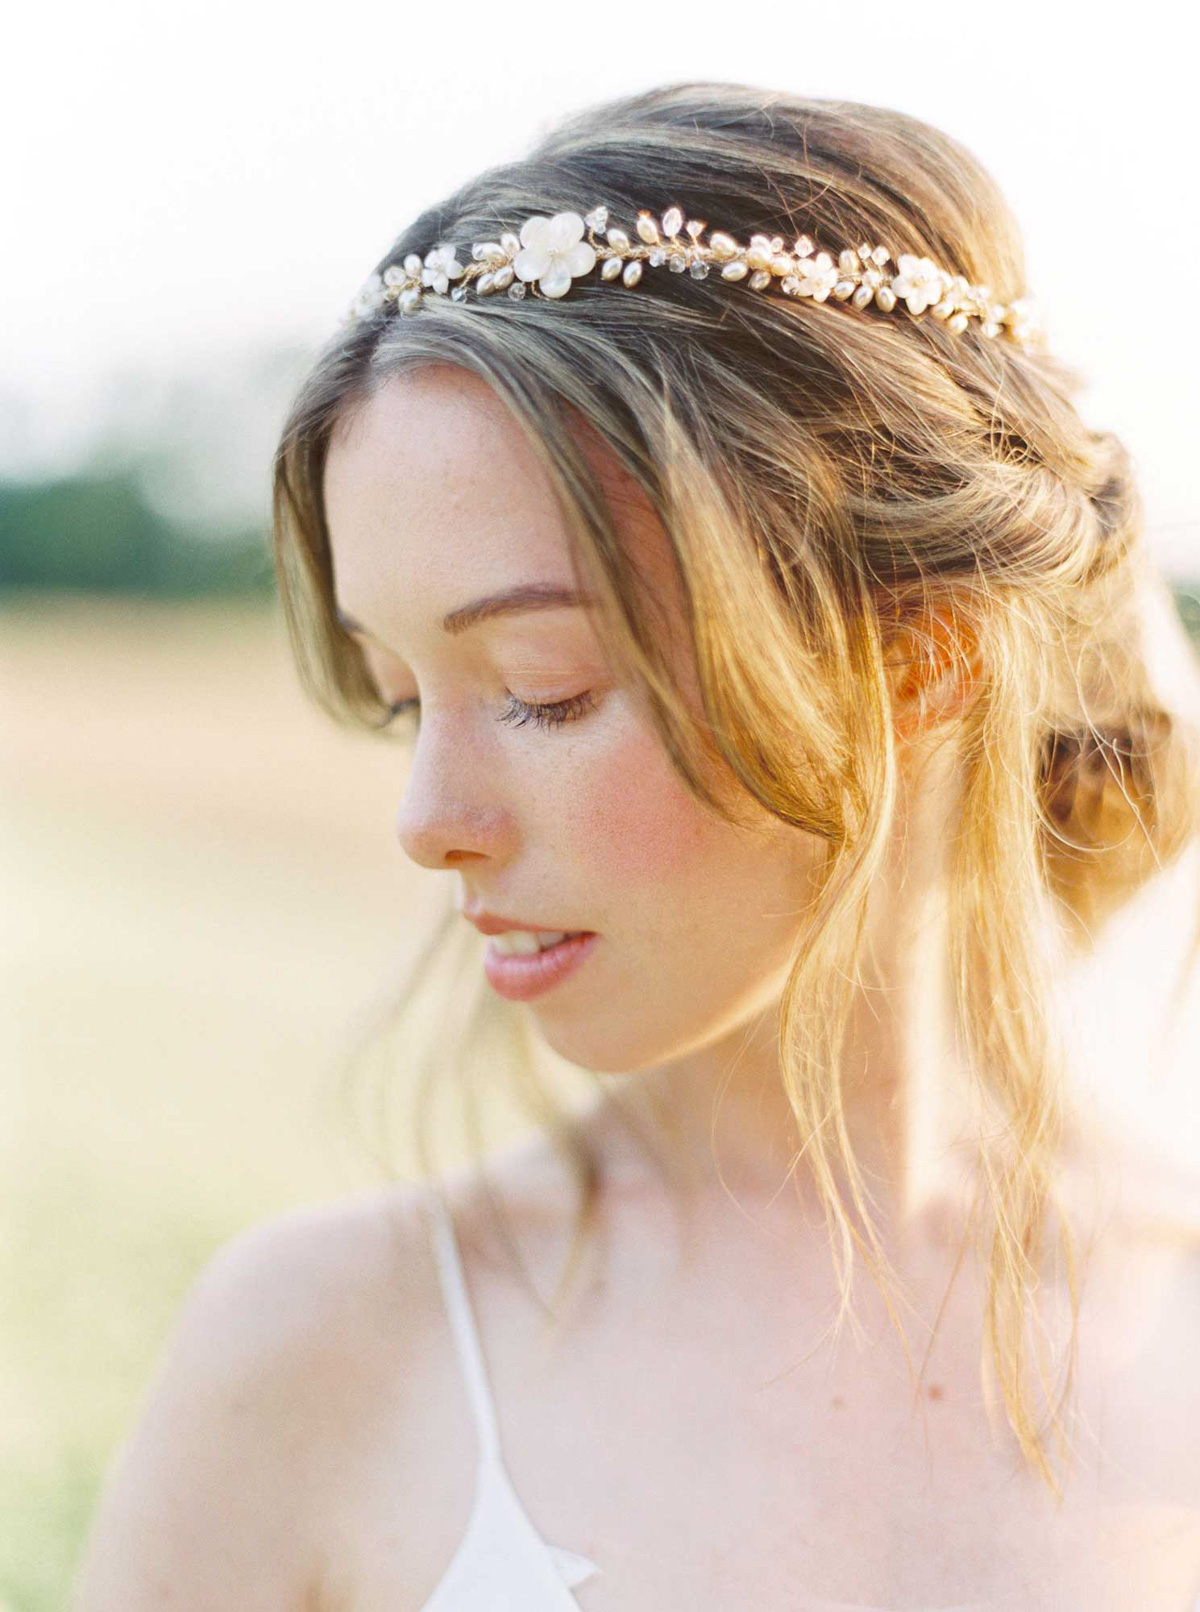 kayla-yestal-vineyard-bride-swish-list-woodland-weddings-niagara-wedding-editorial-27.jpg